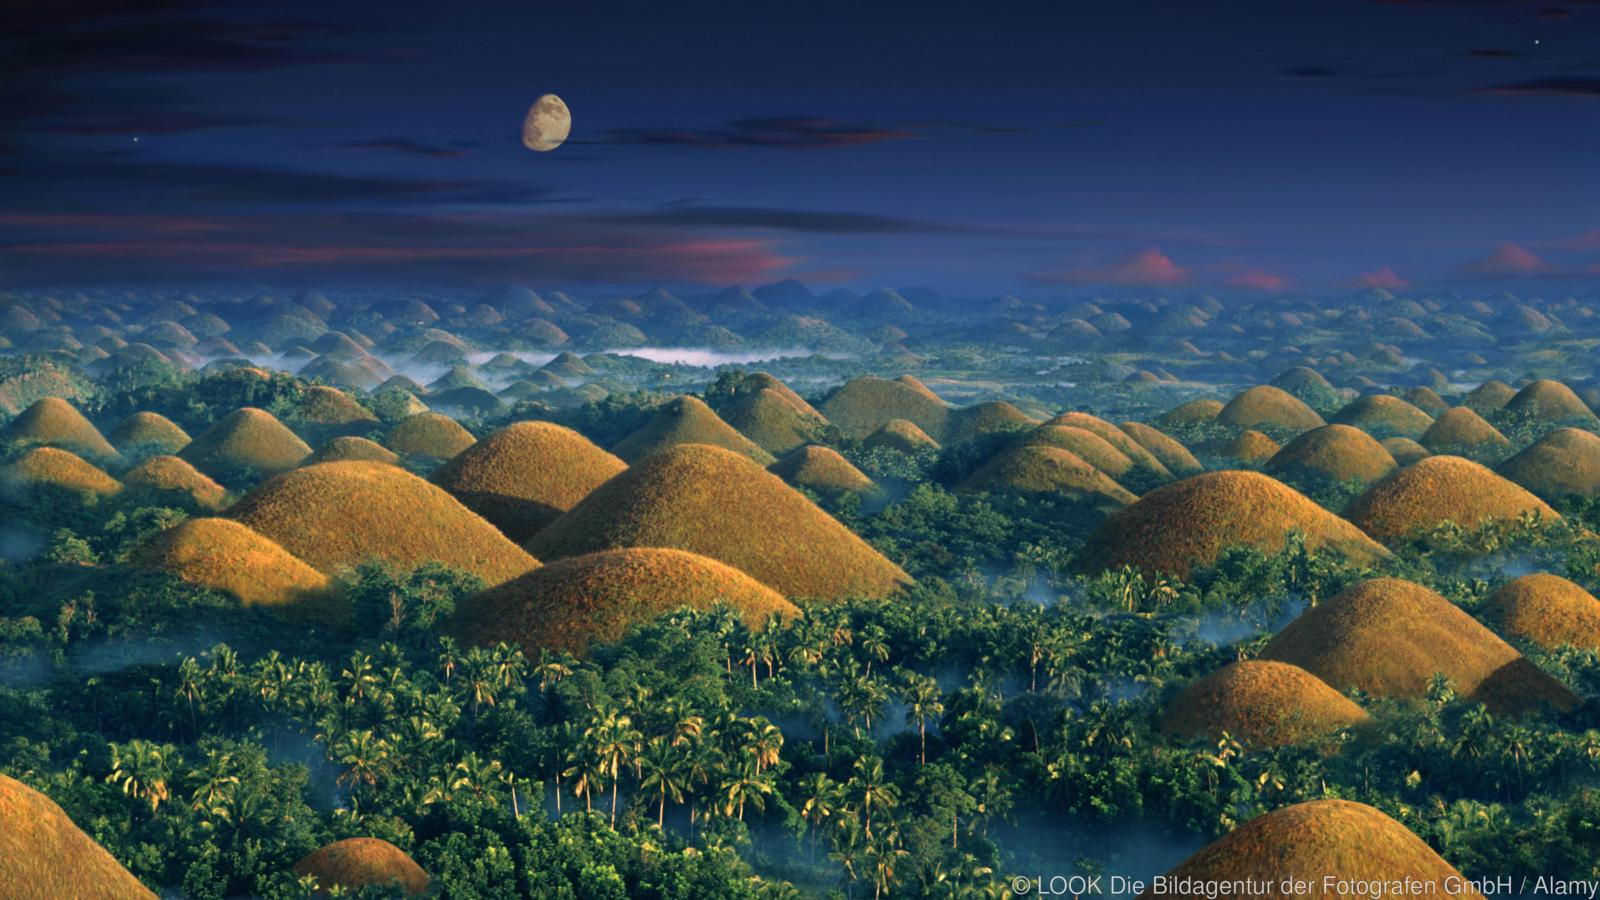 Sunrise over the Chocolate Hills, near Carmen, Chocolate Hills, UNESCO World Nature Site, Bohol Island, Visayas, Philippines